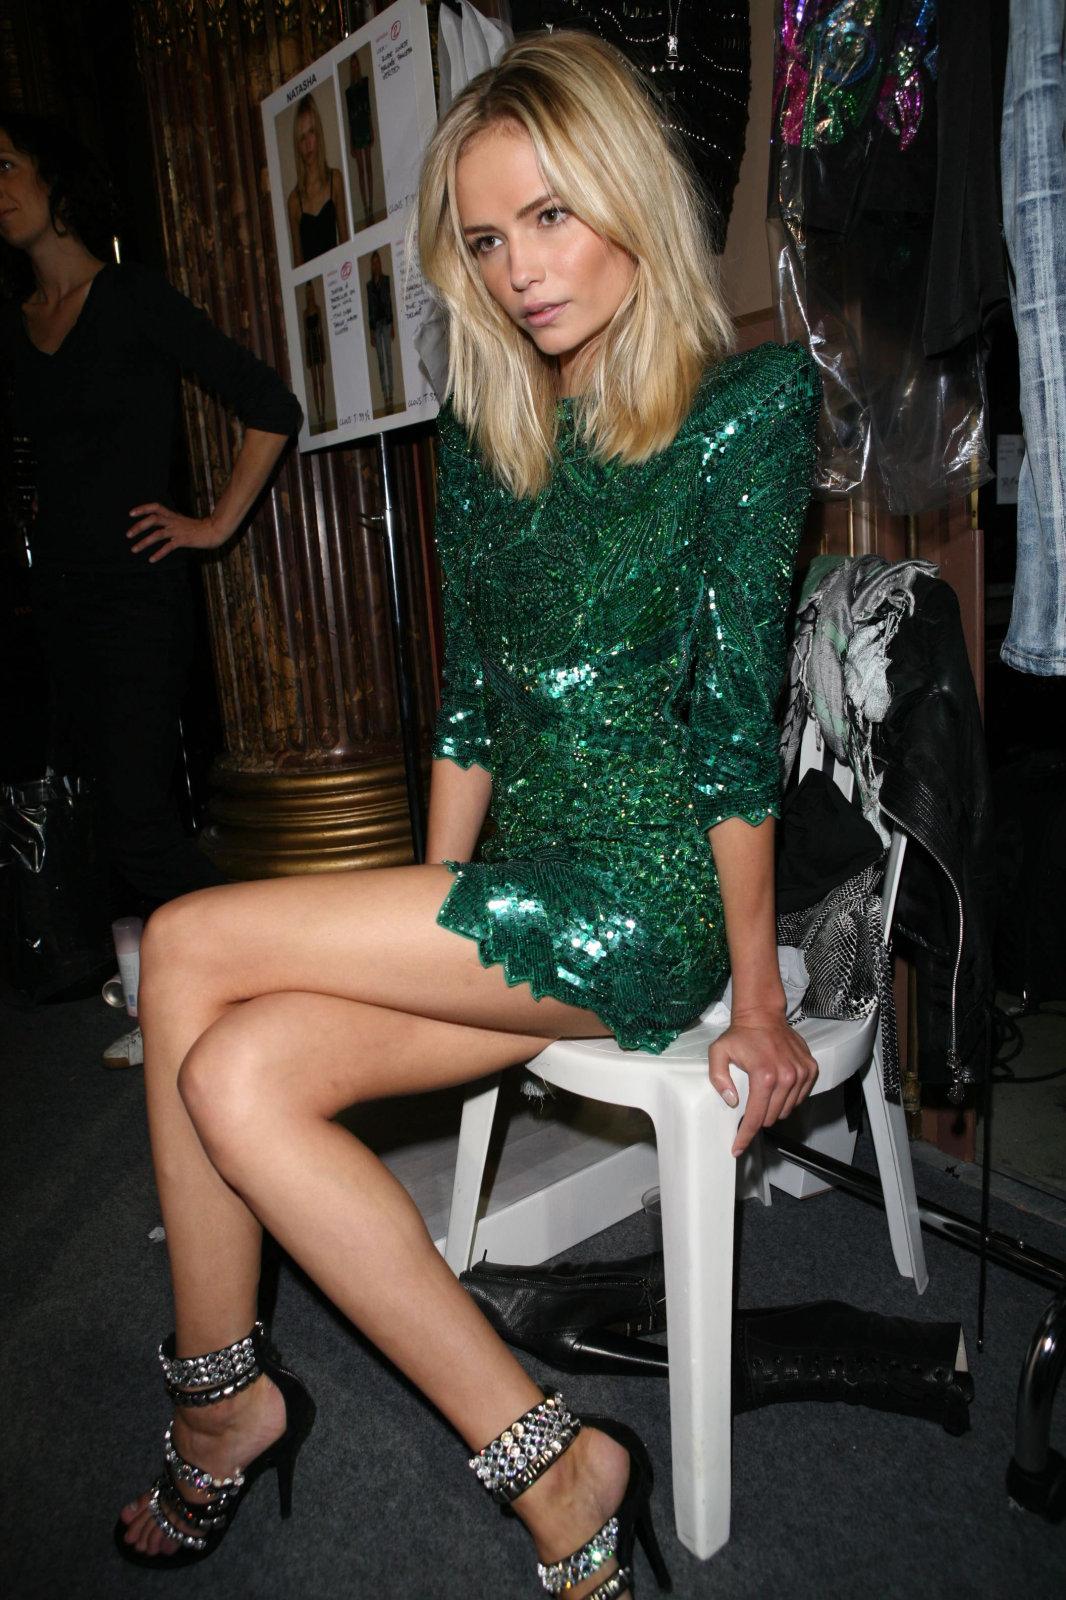 http://4.bp.blogspot.com/-uspTKtDsb4s/TZ1QL3PpGVI/AAAAAAAAAFI/10iDnsflXRE/s1600/poly-in-balmain-emerald2.jpg